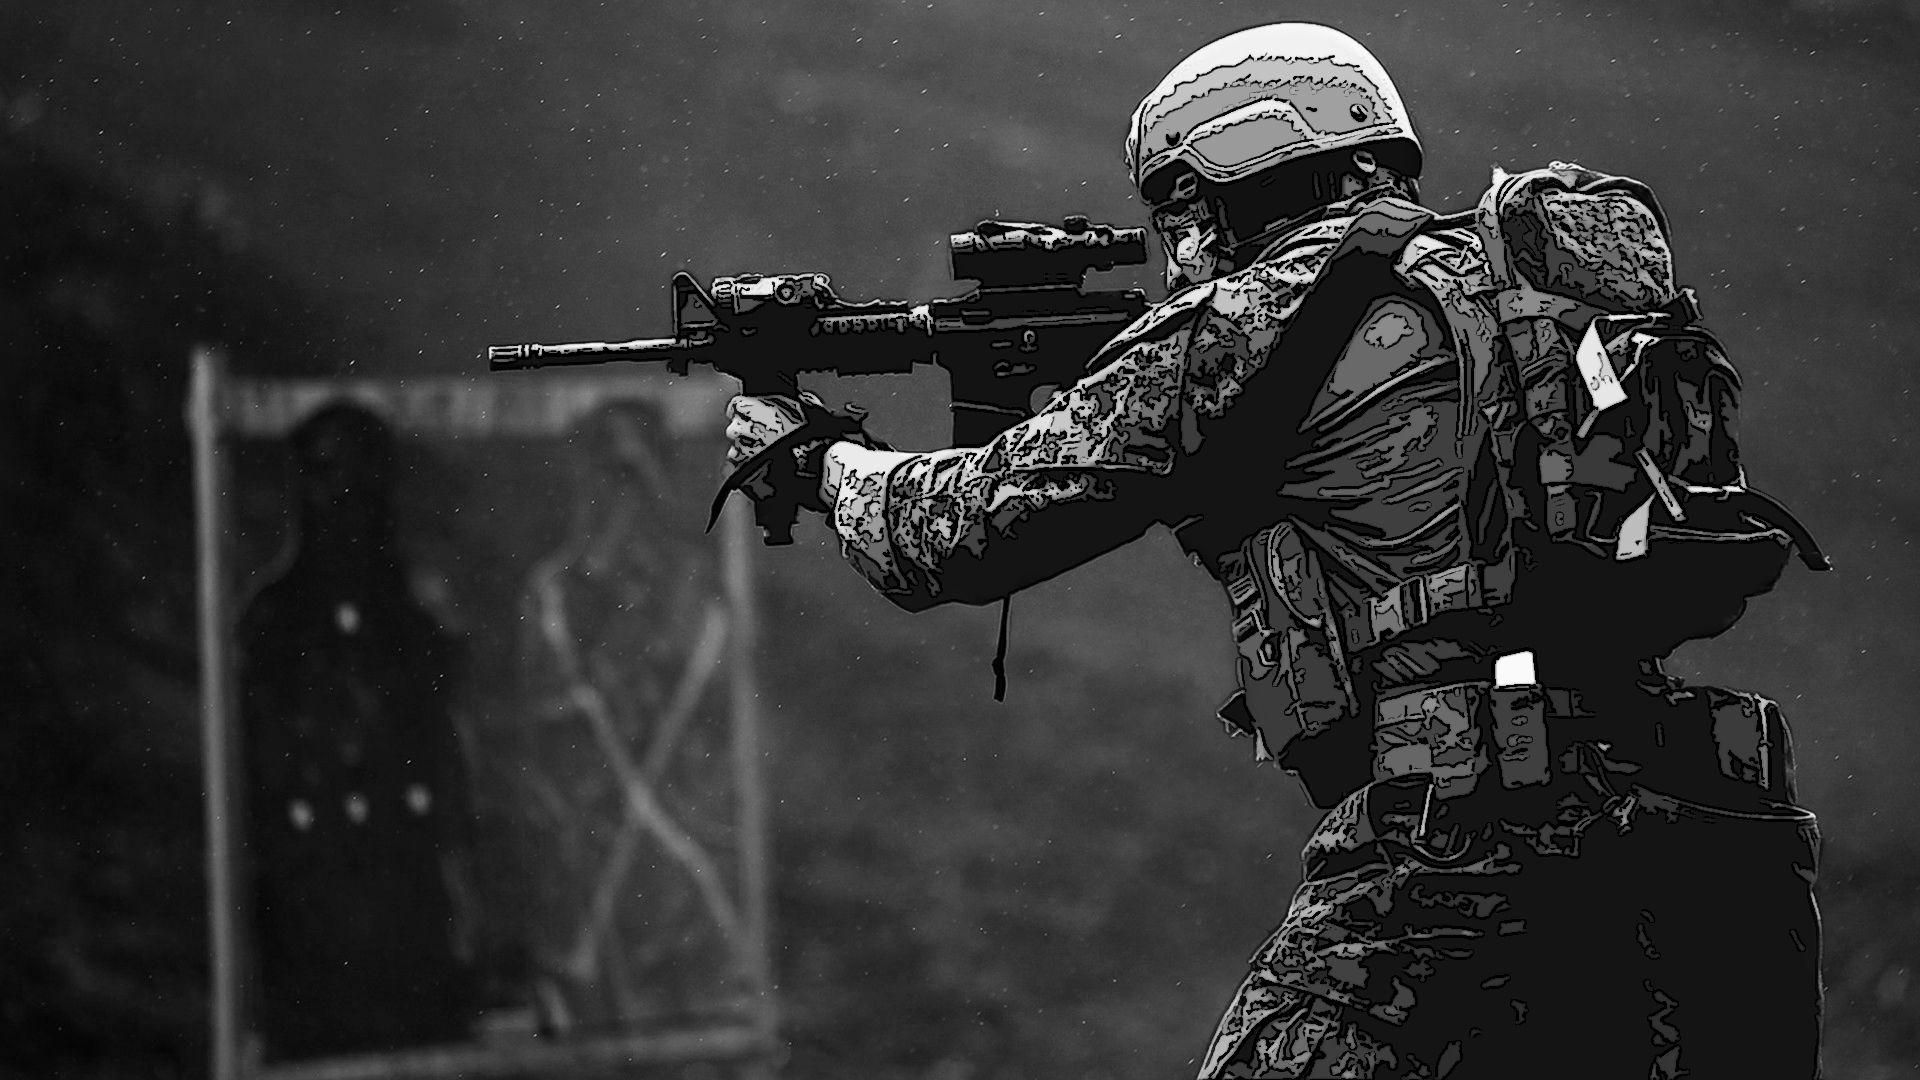 M United States Marine Corps Pohakuloa Training Area Wallpapers